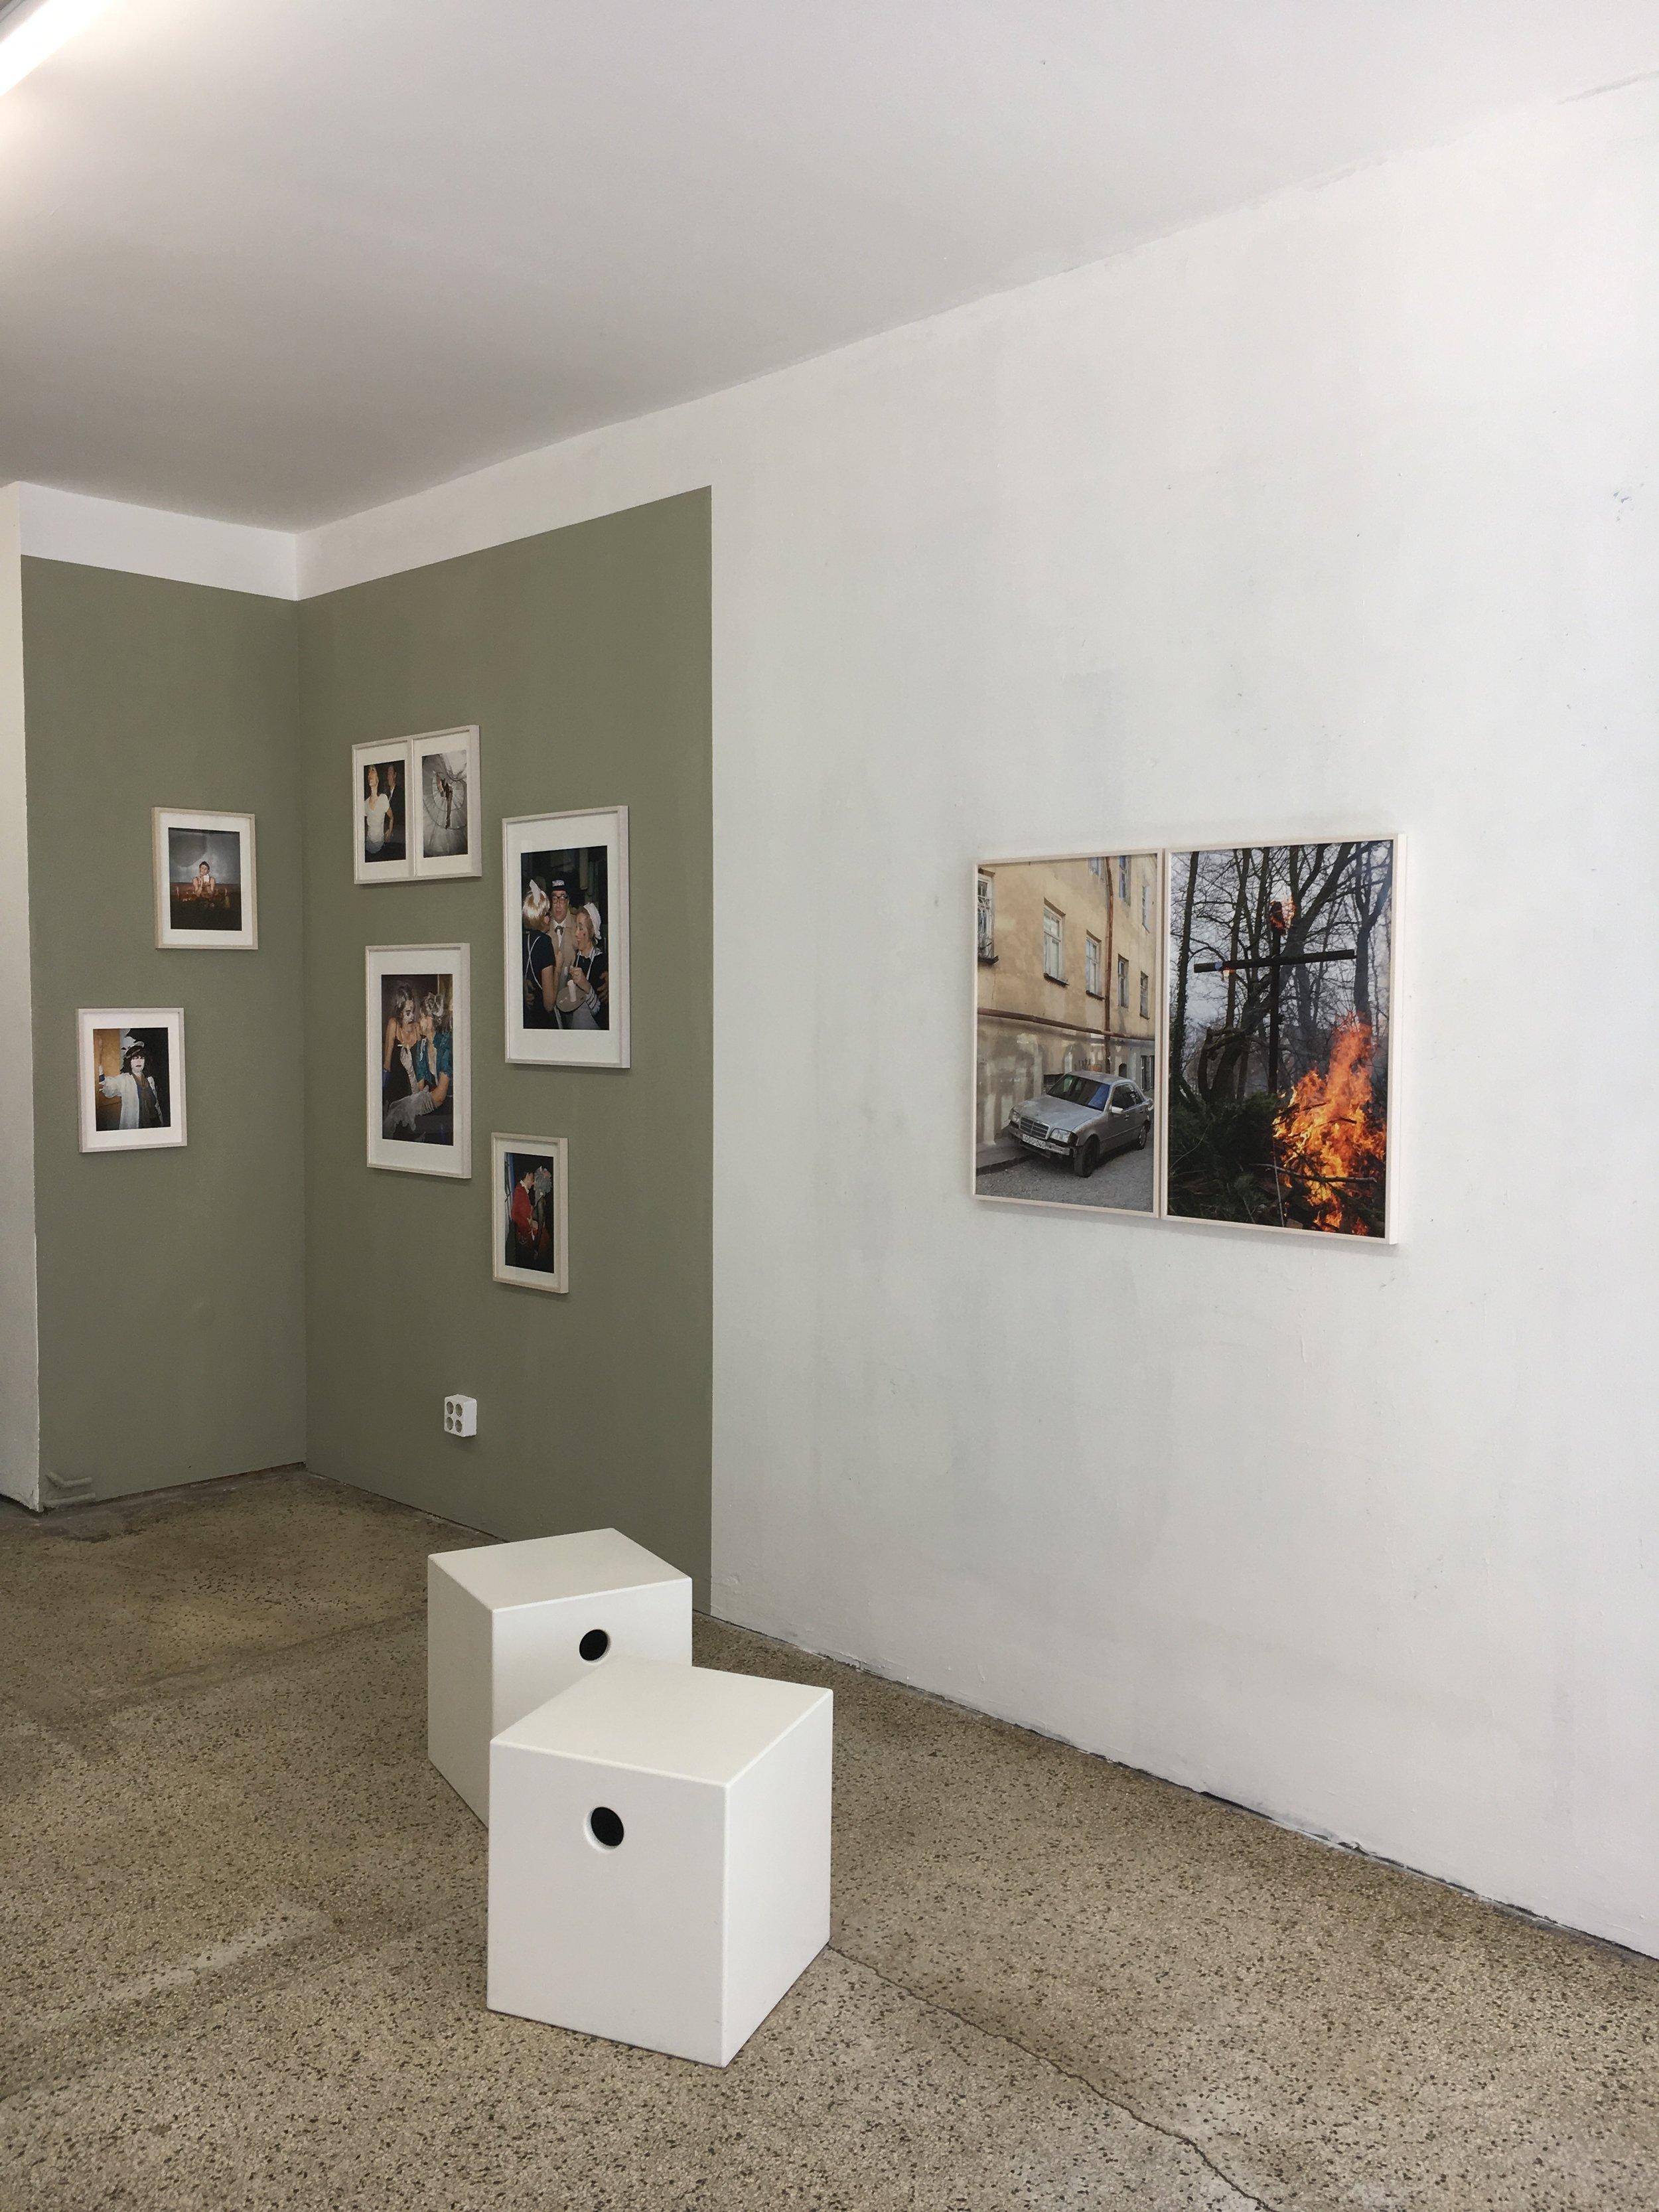 Ute Behrend, Fassade und Tarnung, Scope Galerie 2018